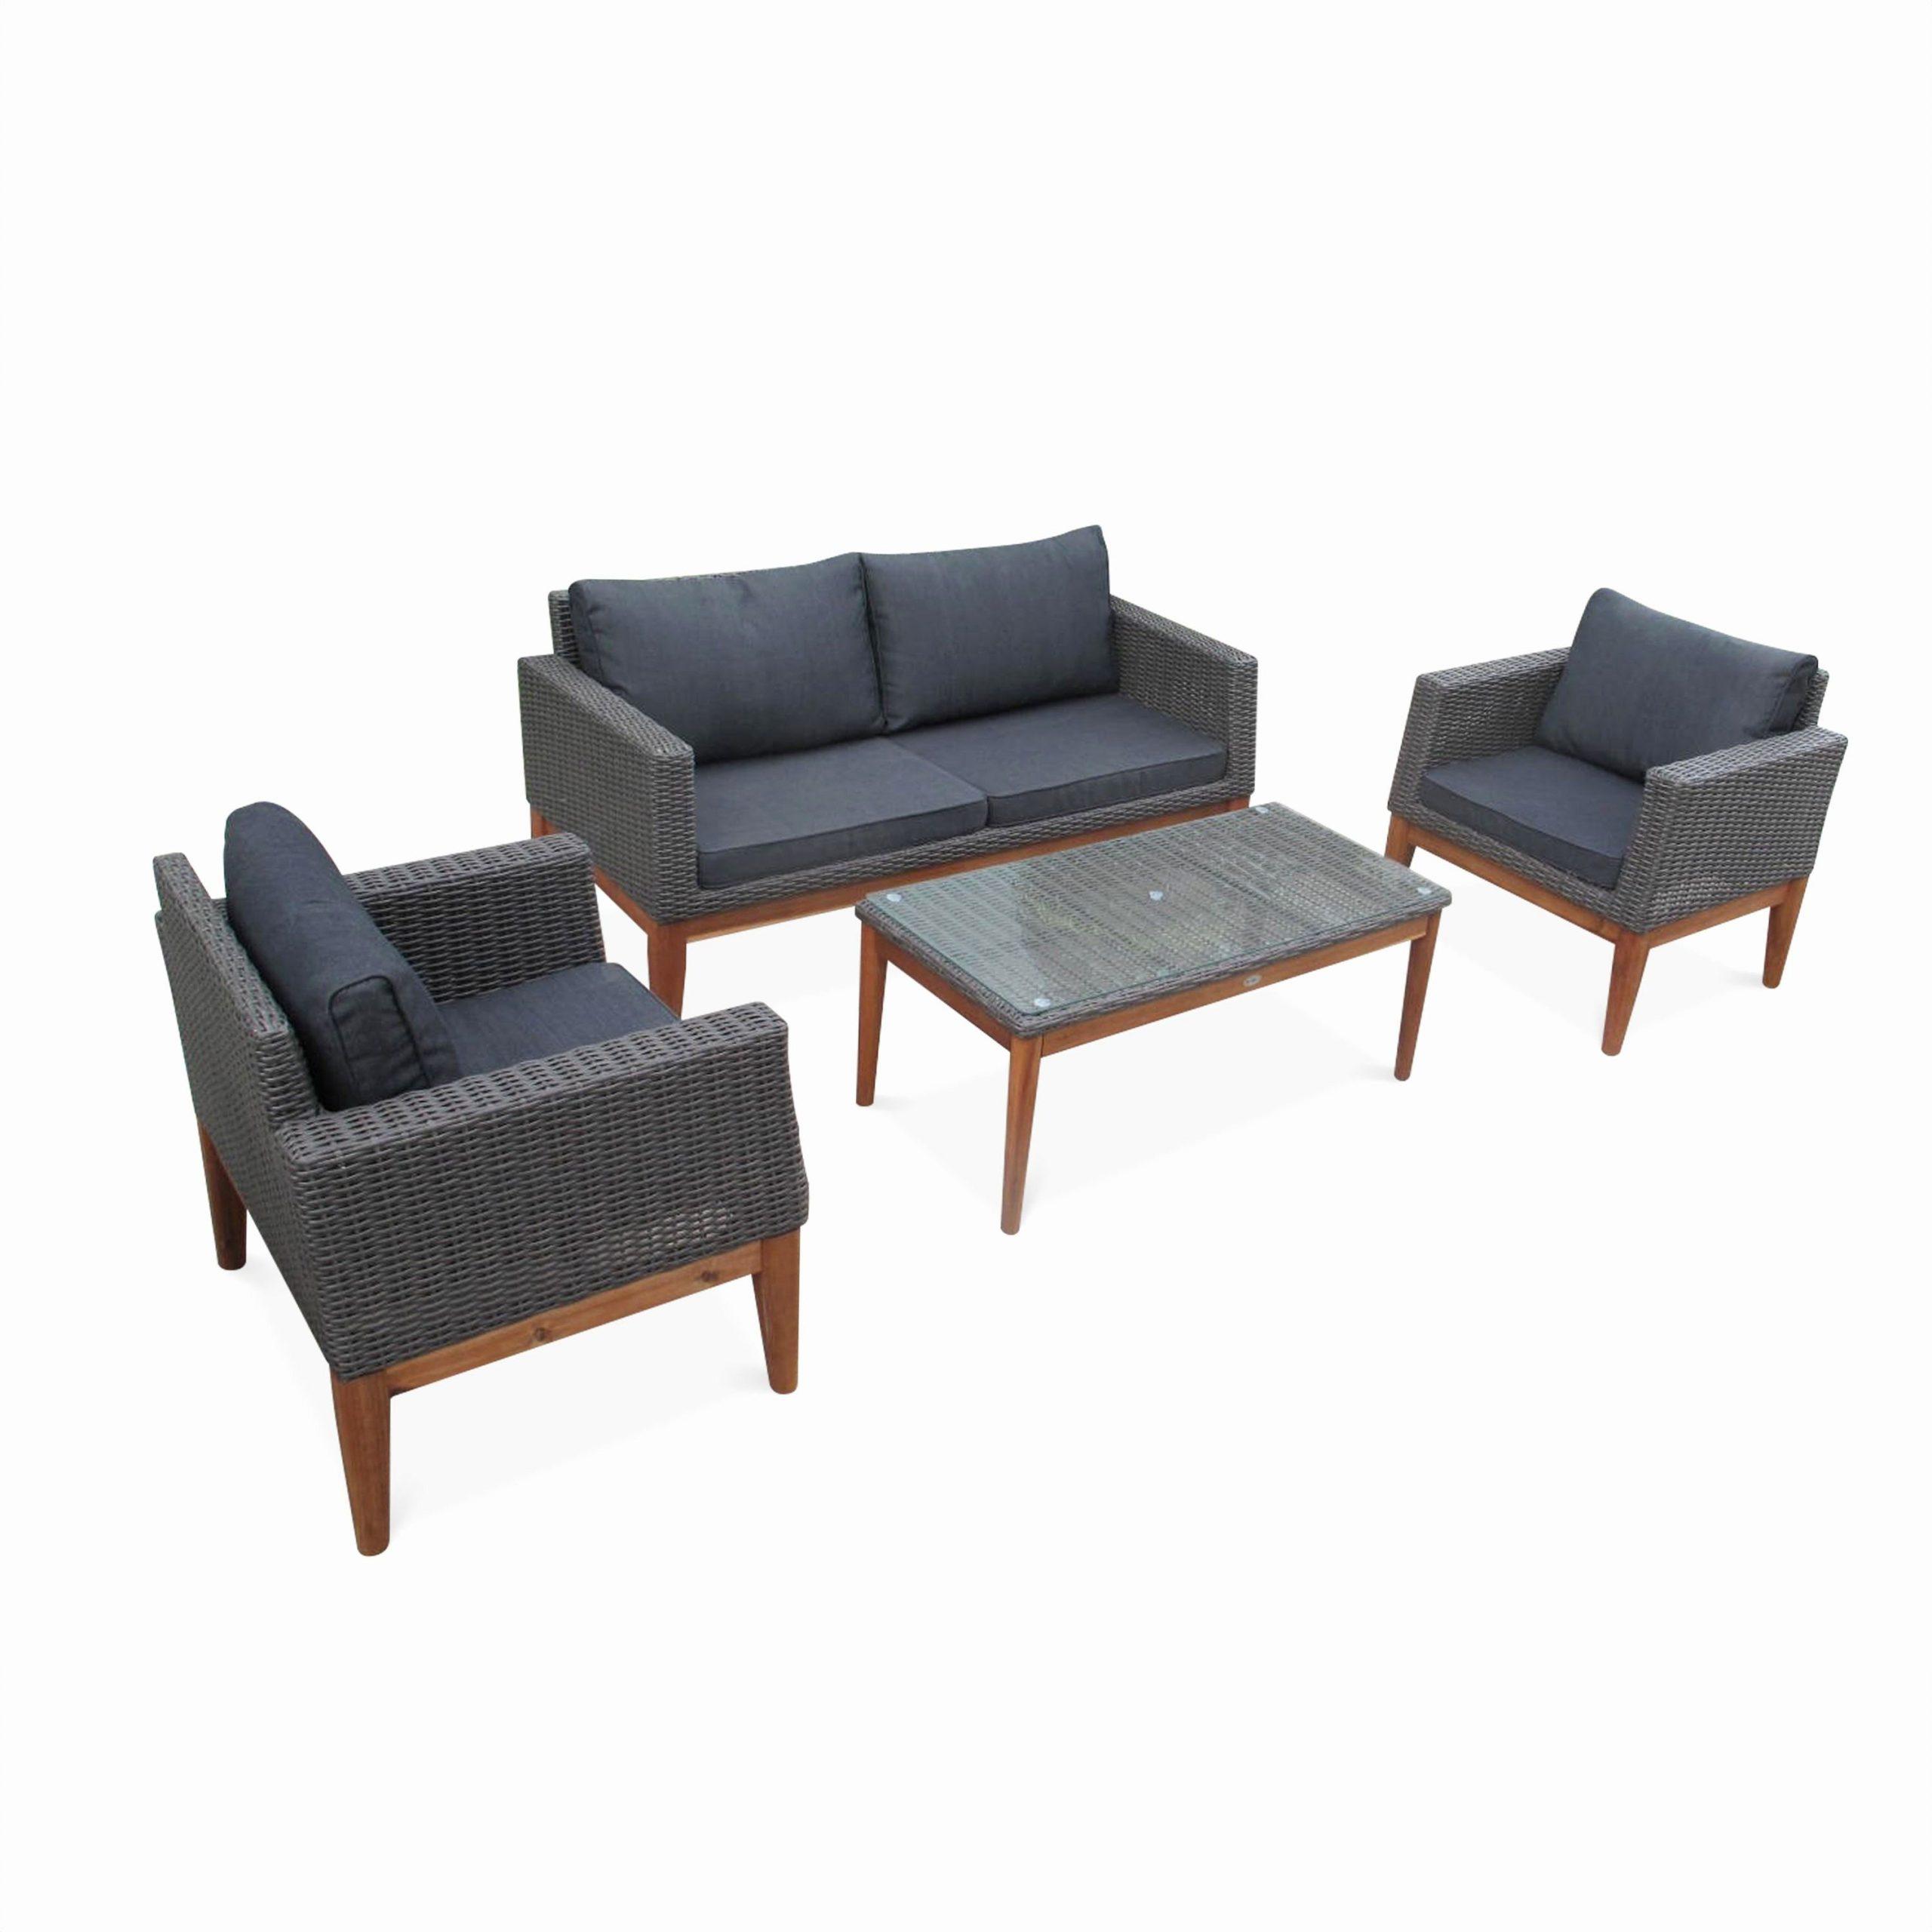 Pin By Prtha Lastnight On Kitchen Design | Garden Sofa Set ... avec Salon Jardin Alice Garden